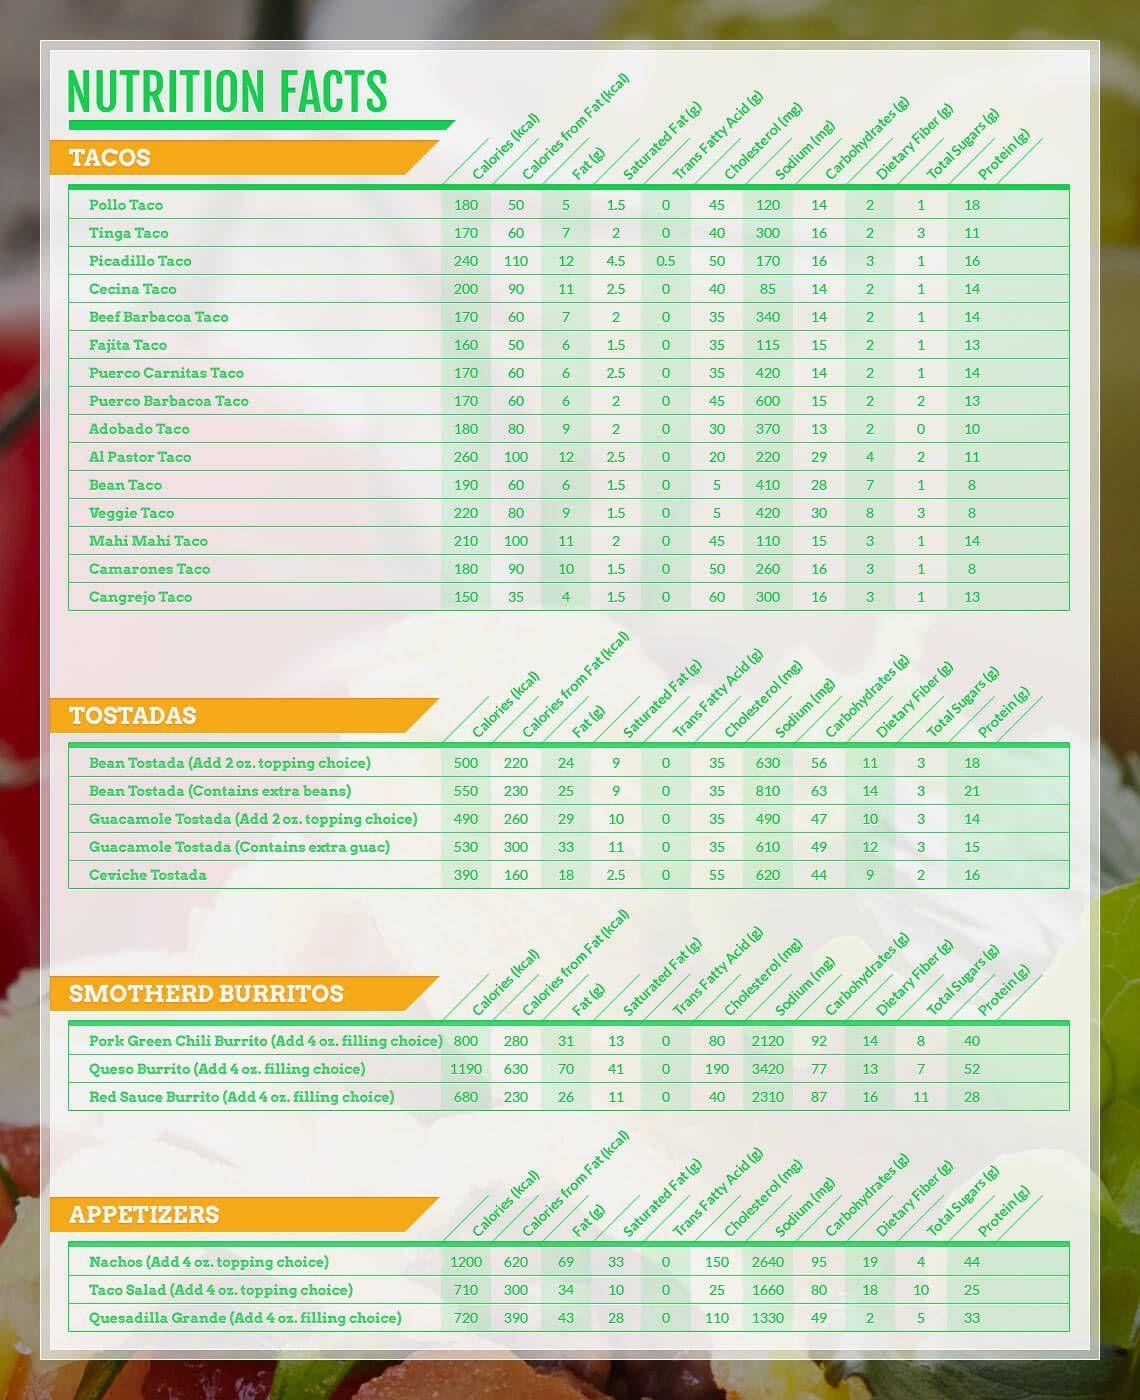 yolandas_infographic1.jpg